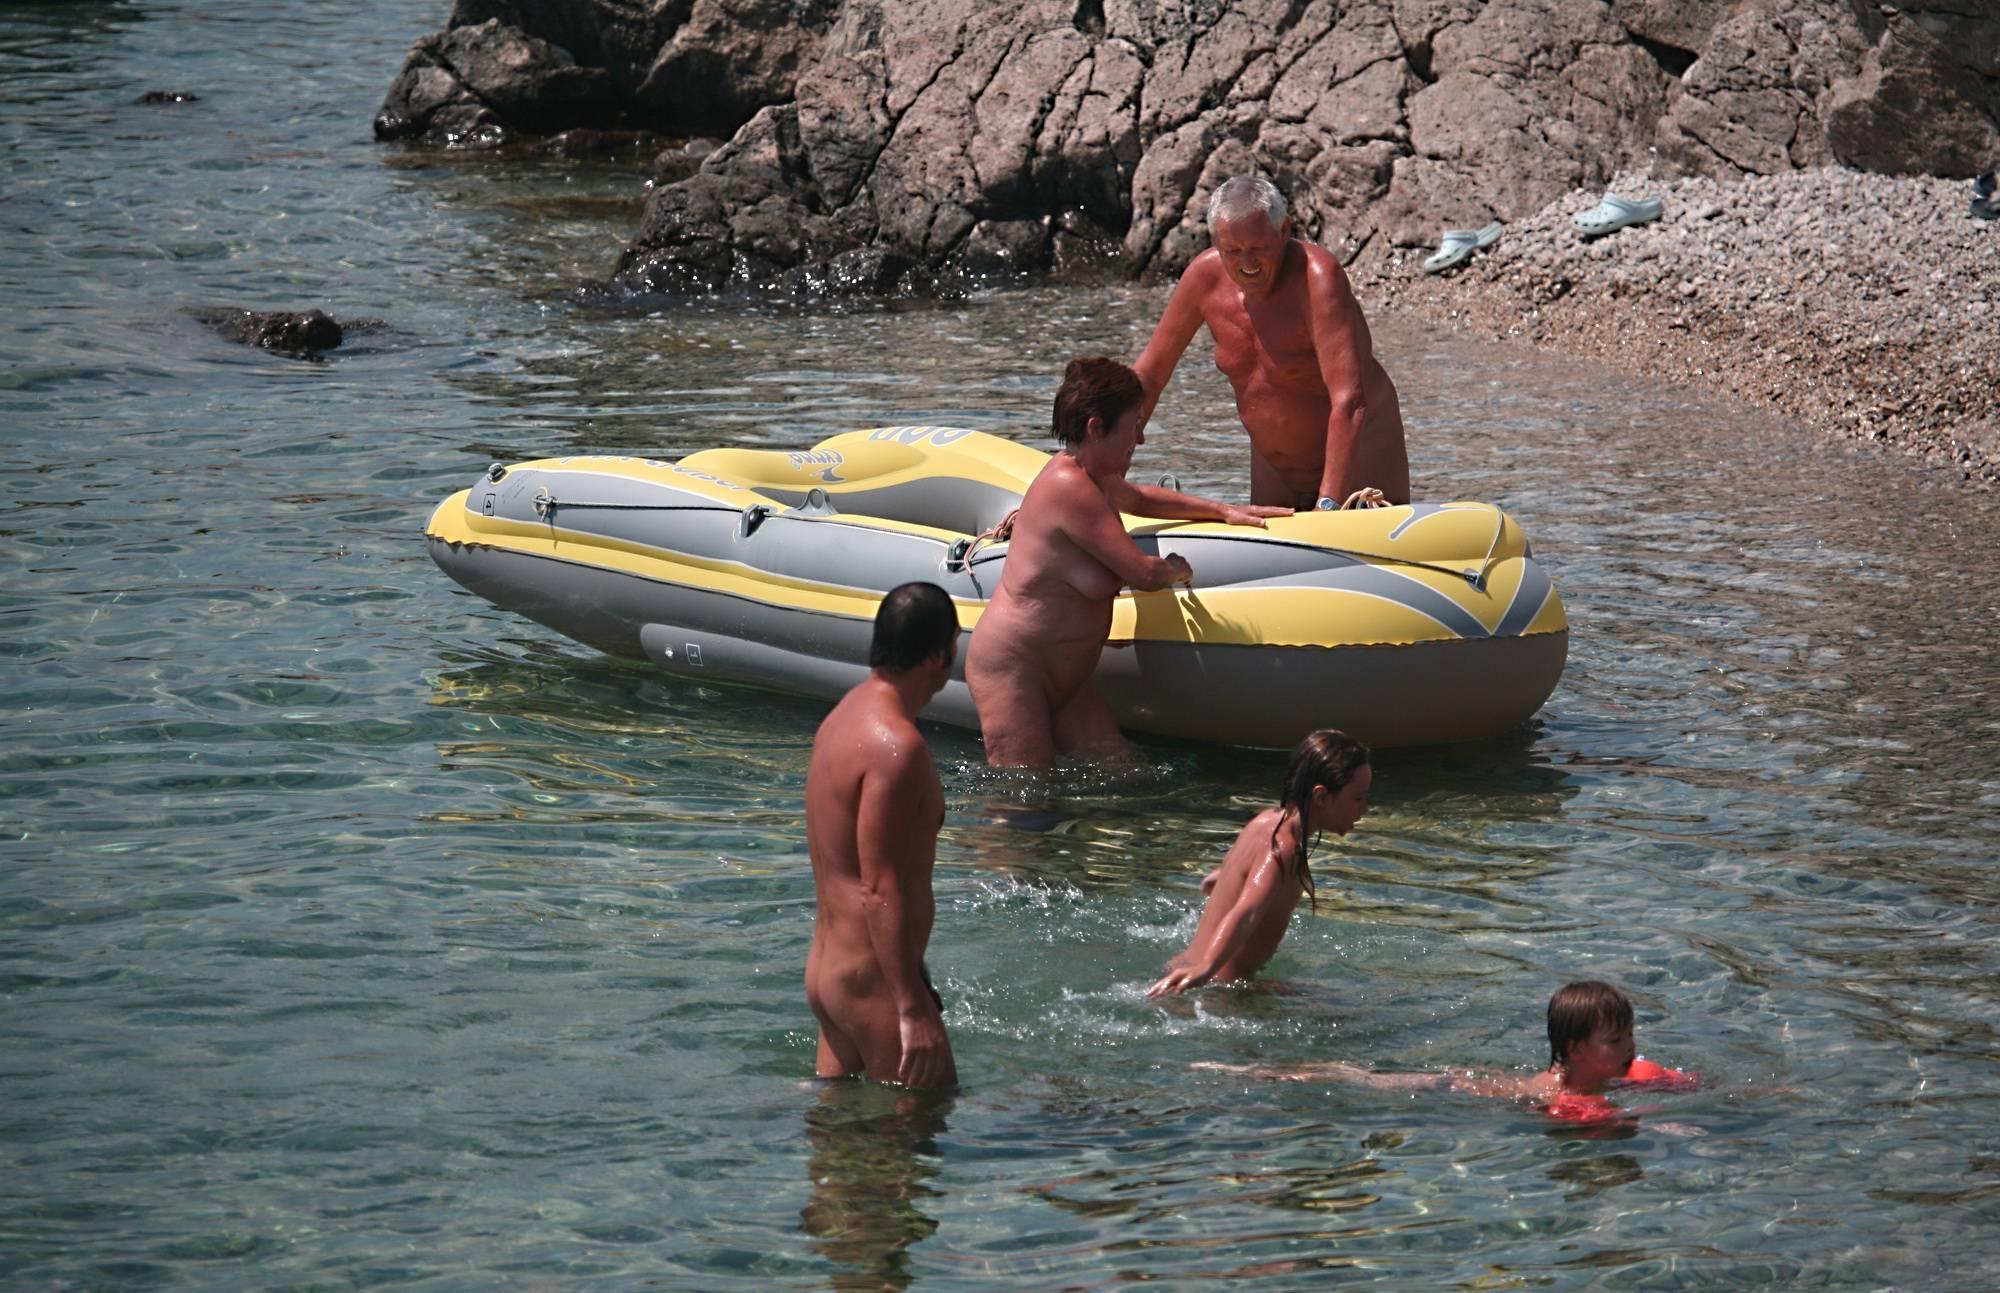 Purenudism Gallery Lone Nudist in Yellow Boat - 3